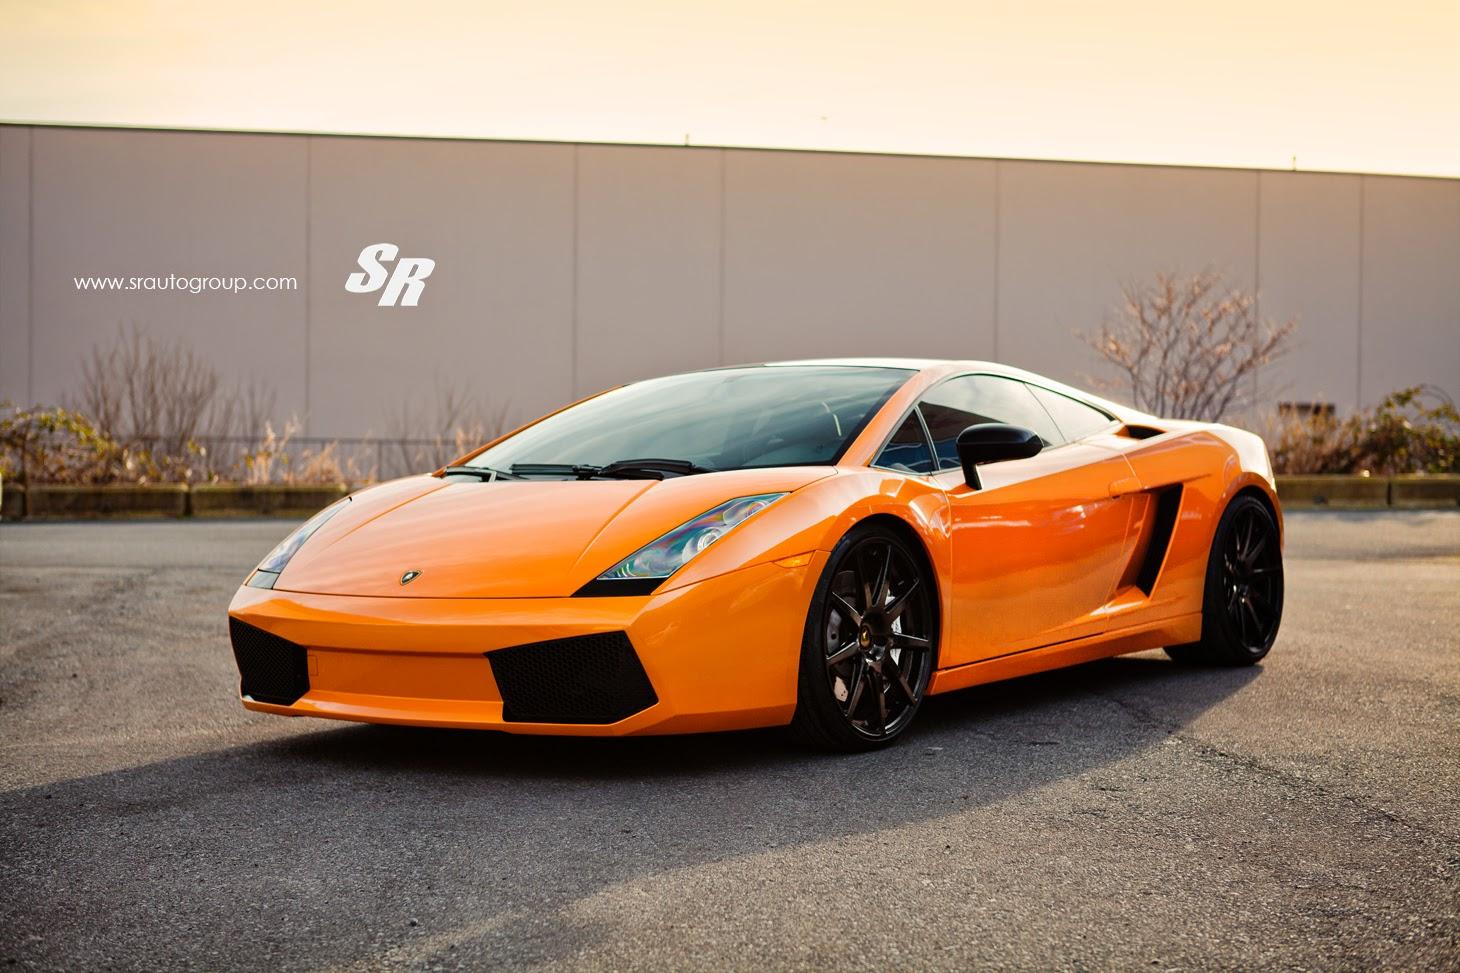 Kumpulan Foto Mobil Lamborghini Super Keren Terbaru ...